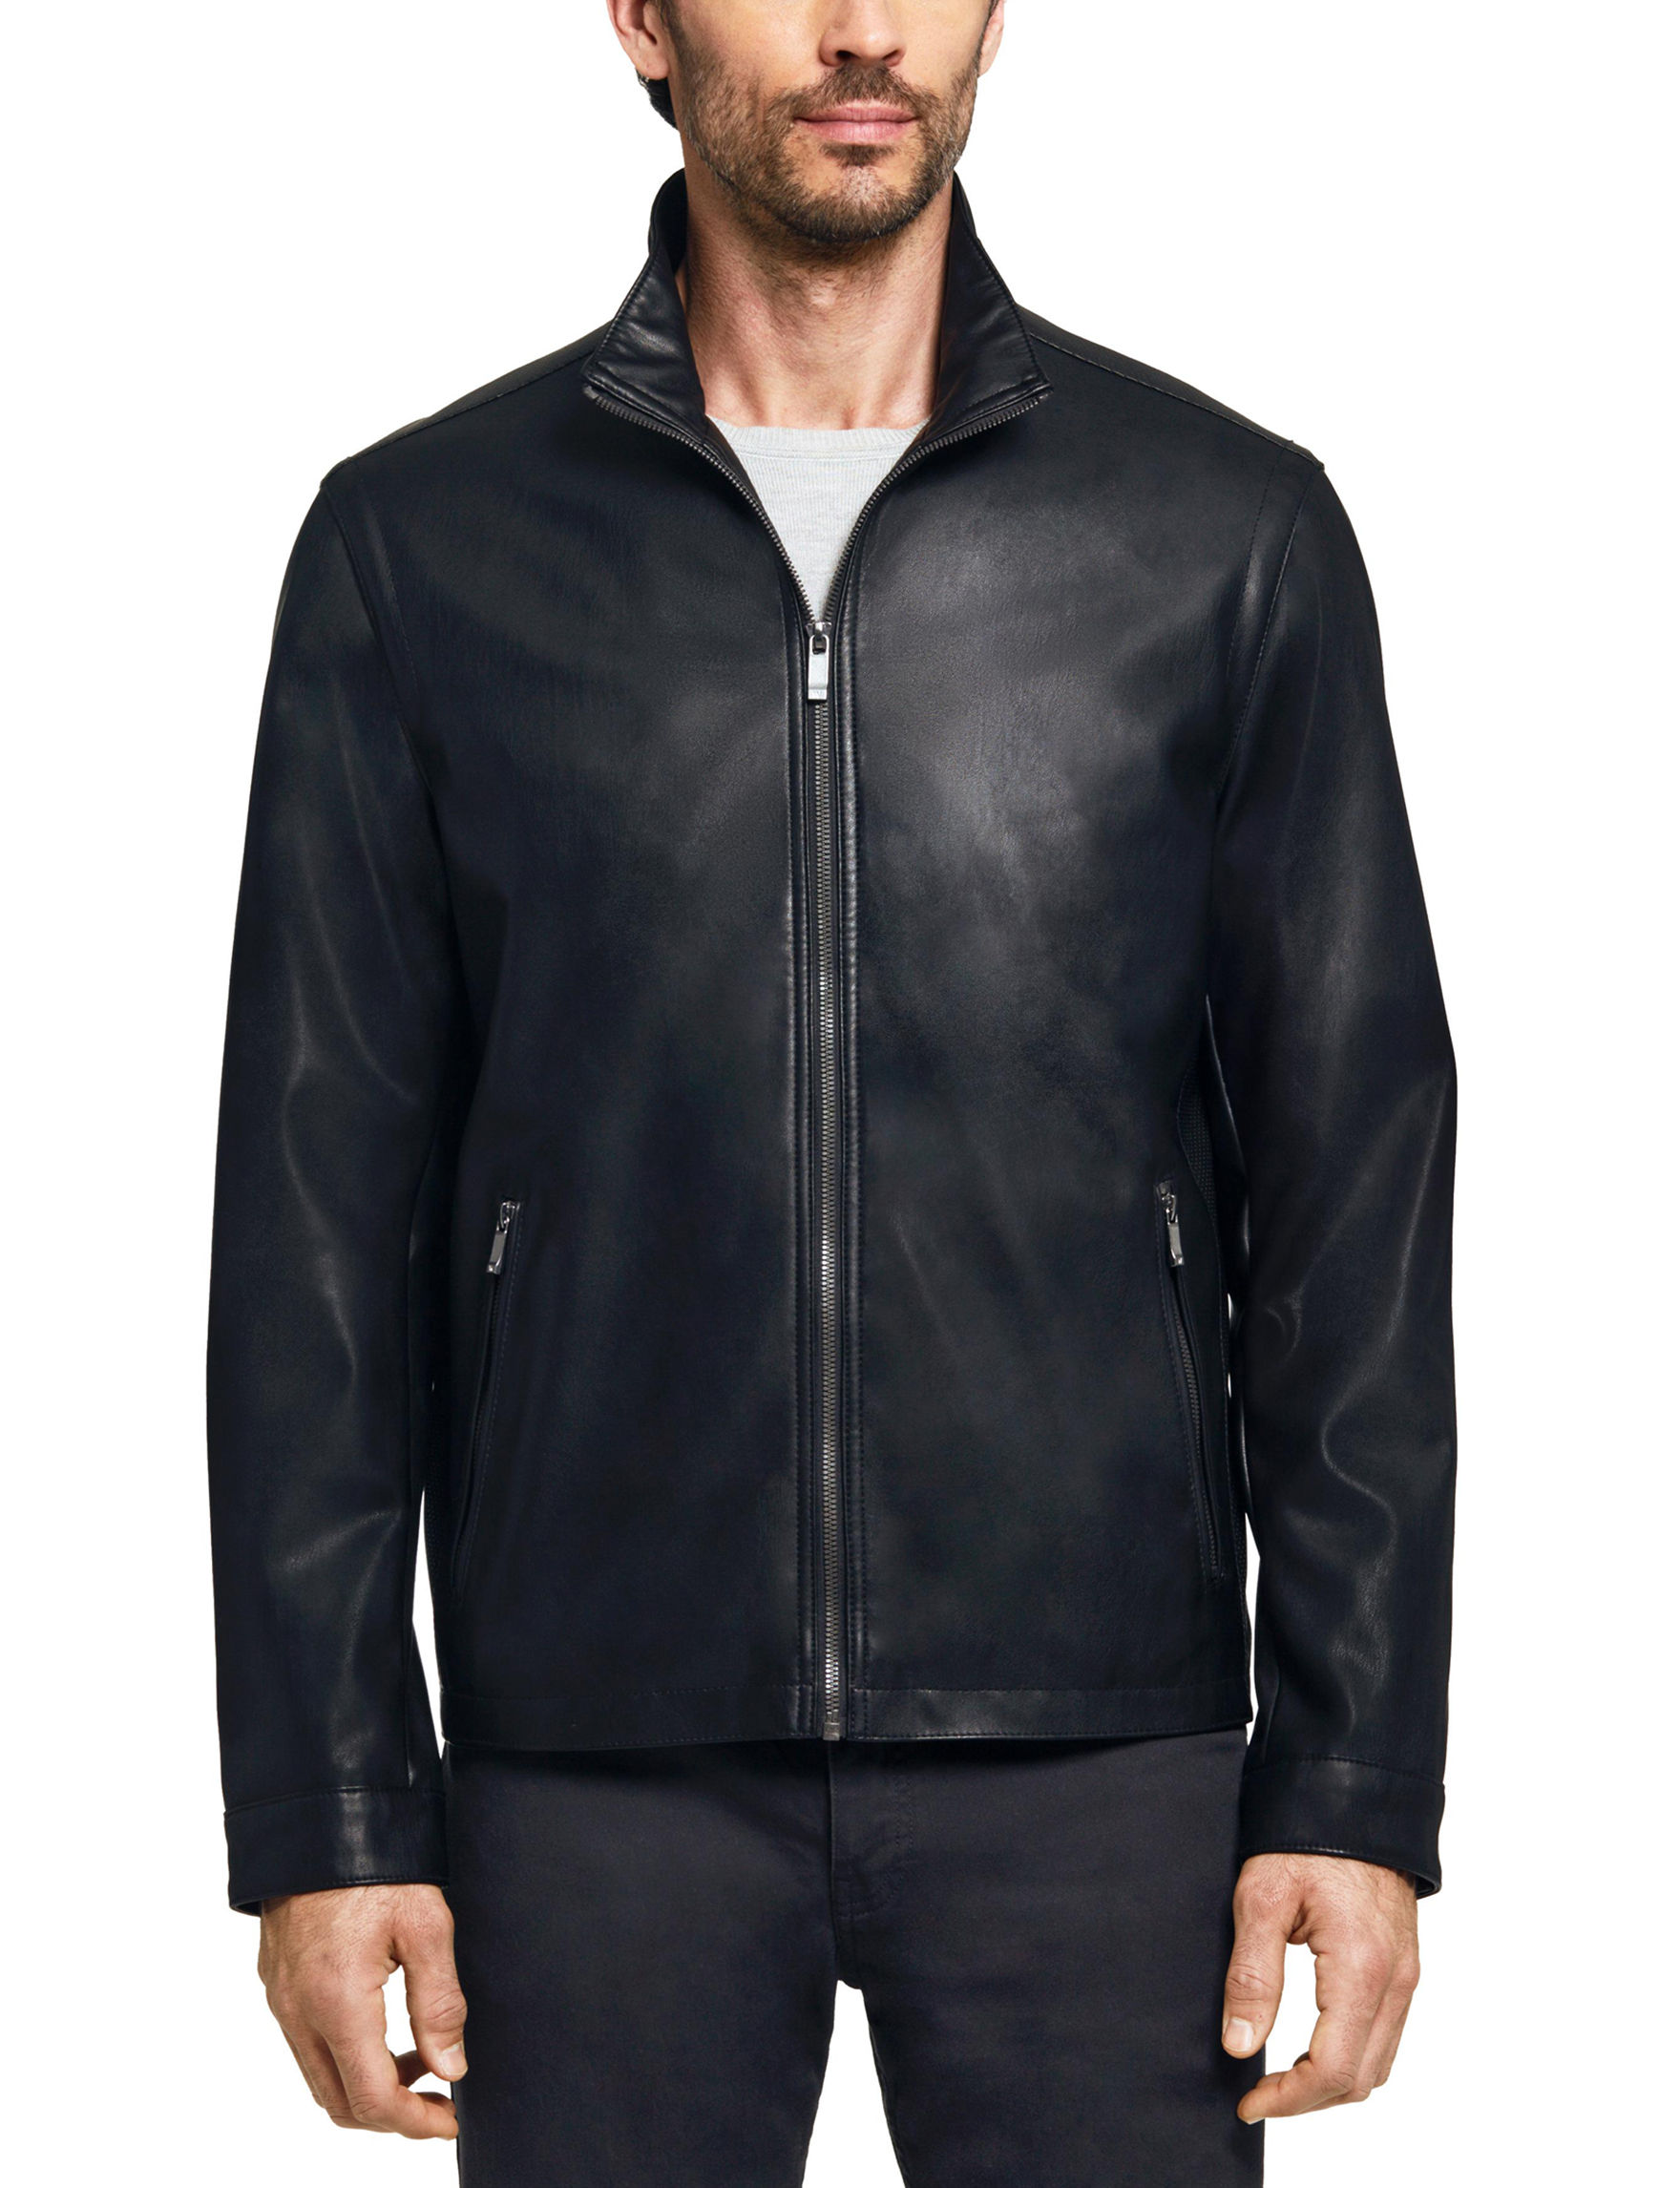 Weatherproof Black Bomber & Moto Jackets